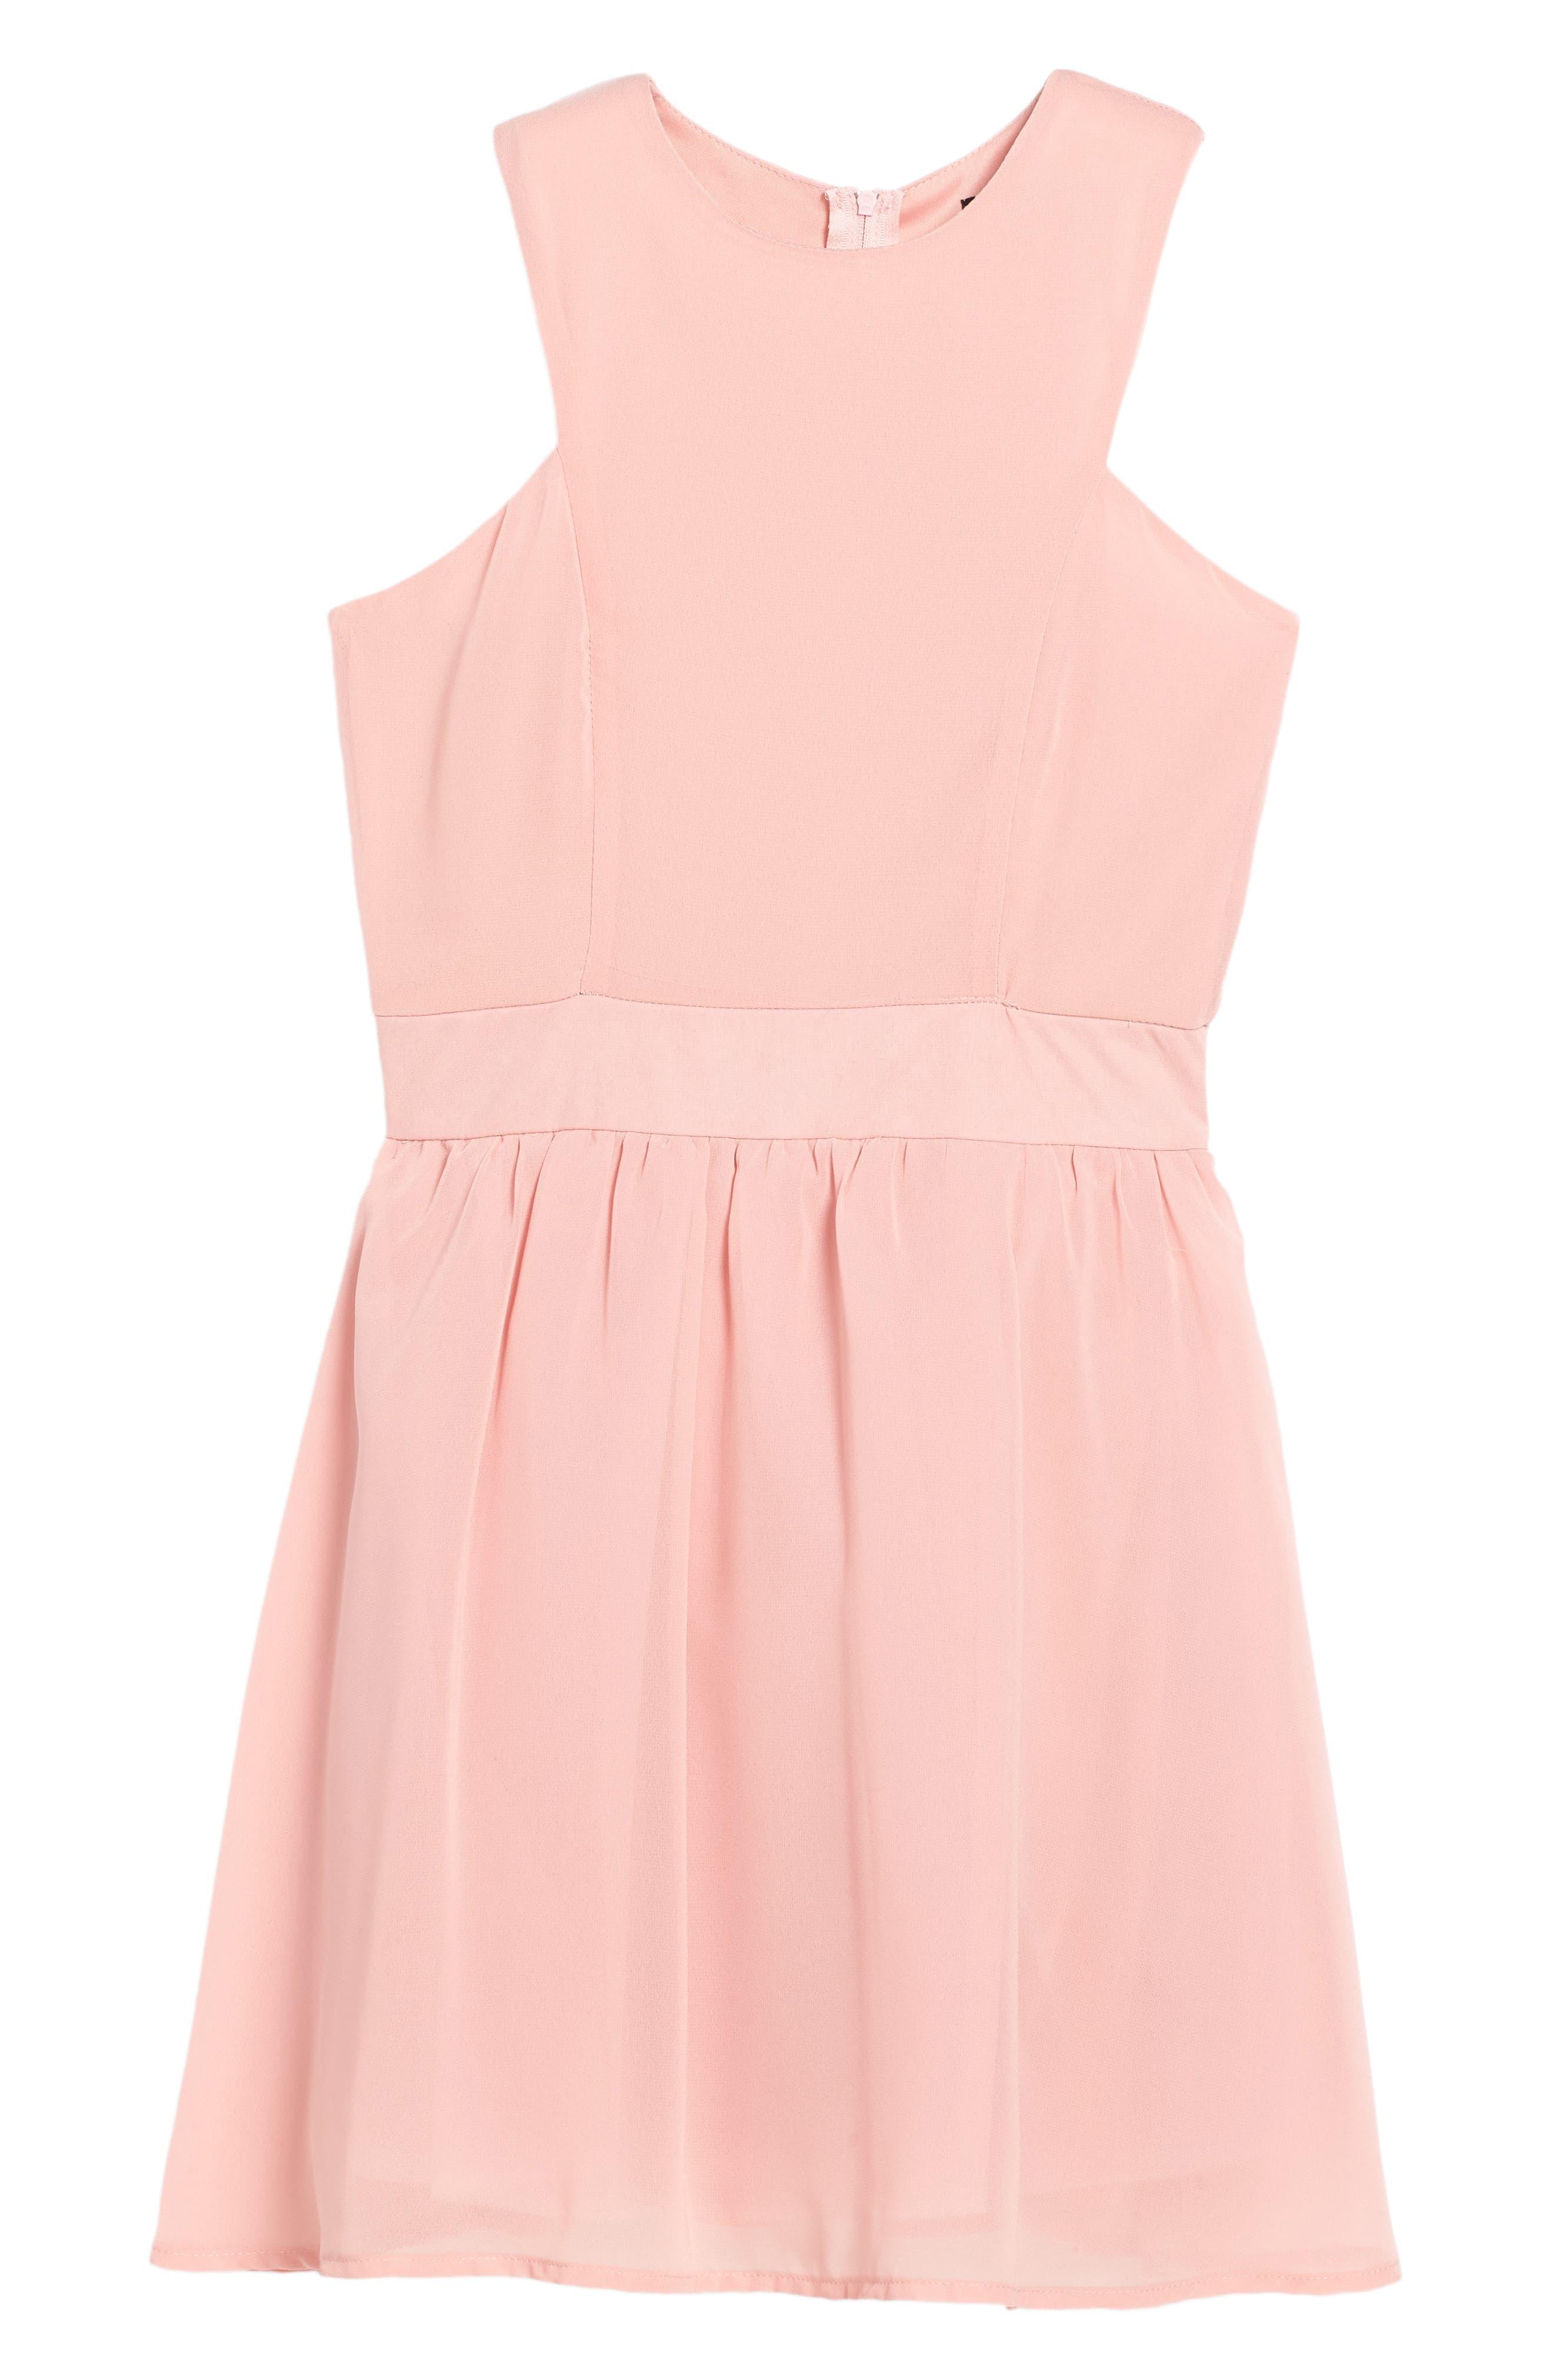 Main Image - Penelope Tree Camilla Sleeveless Dress (Big Girls)